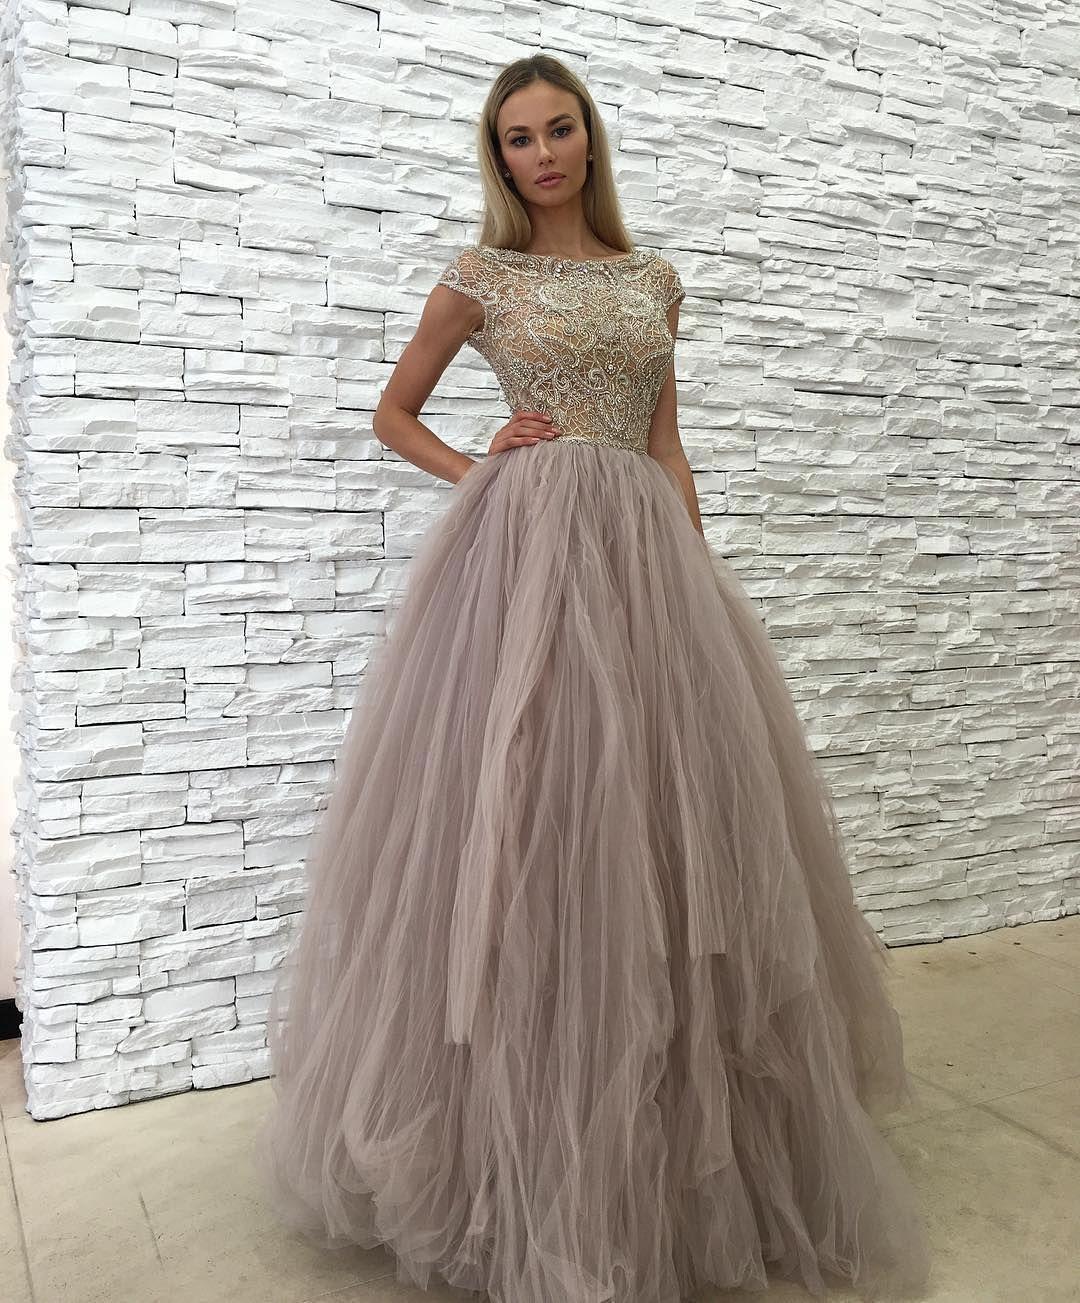 Fashion dress for wedding party  fashionclassypost u Instagram photos and videos  Prom